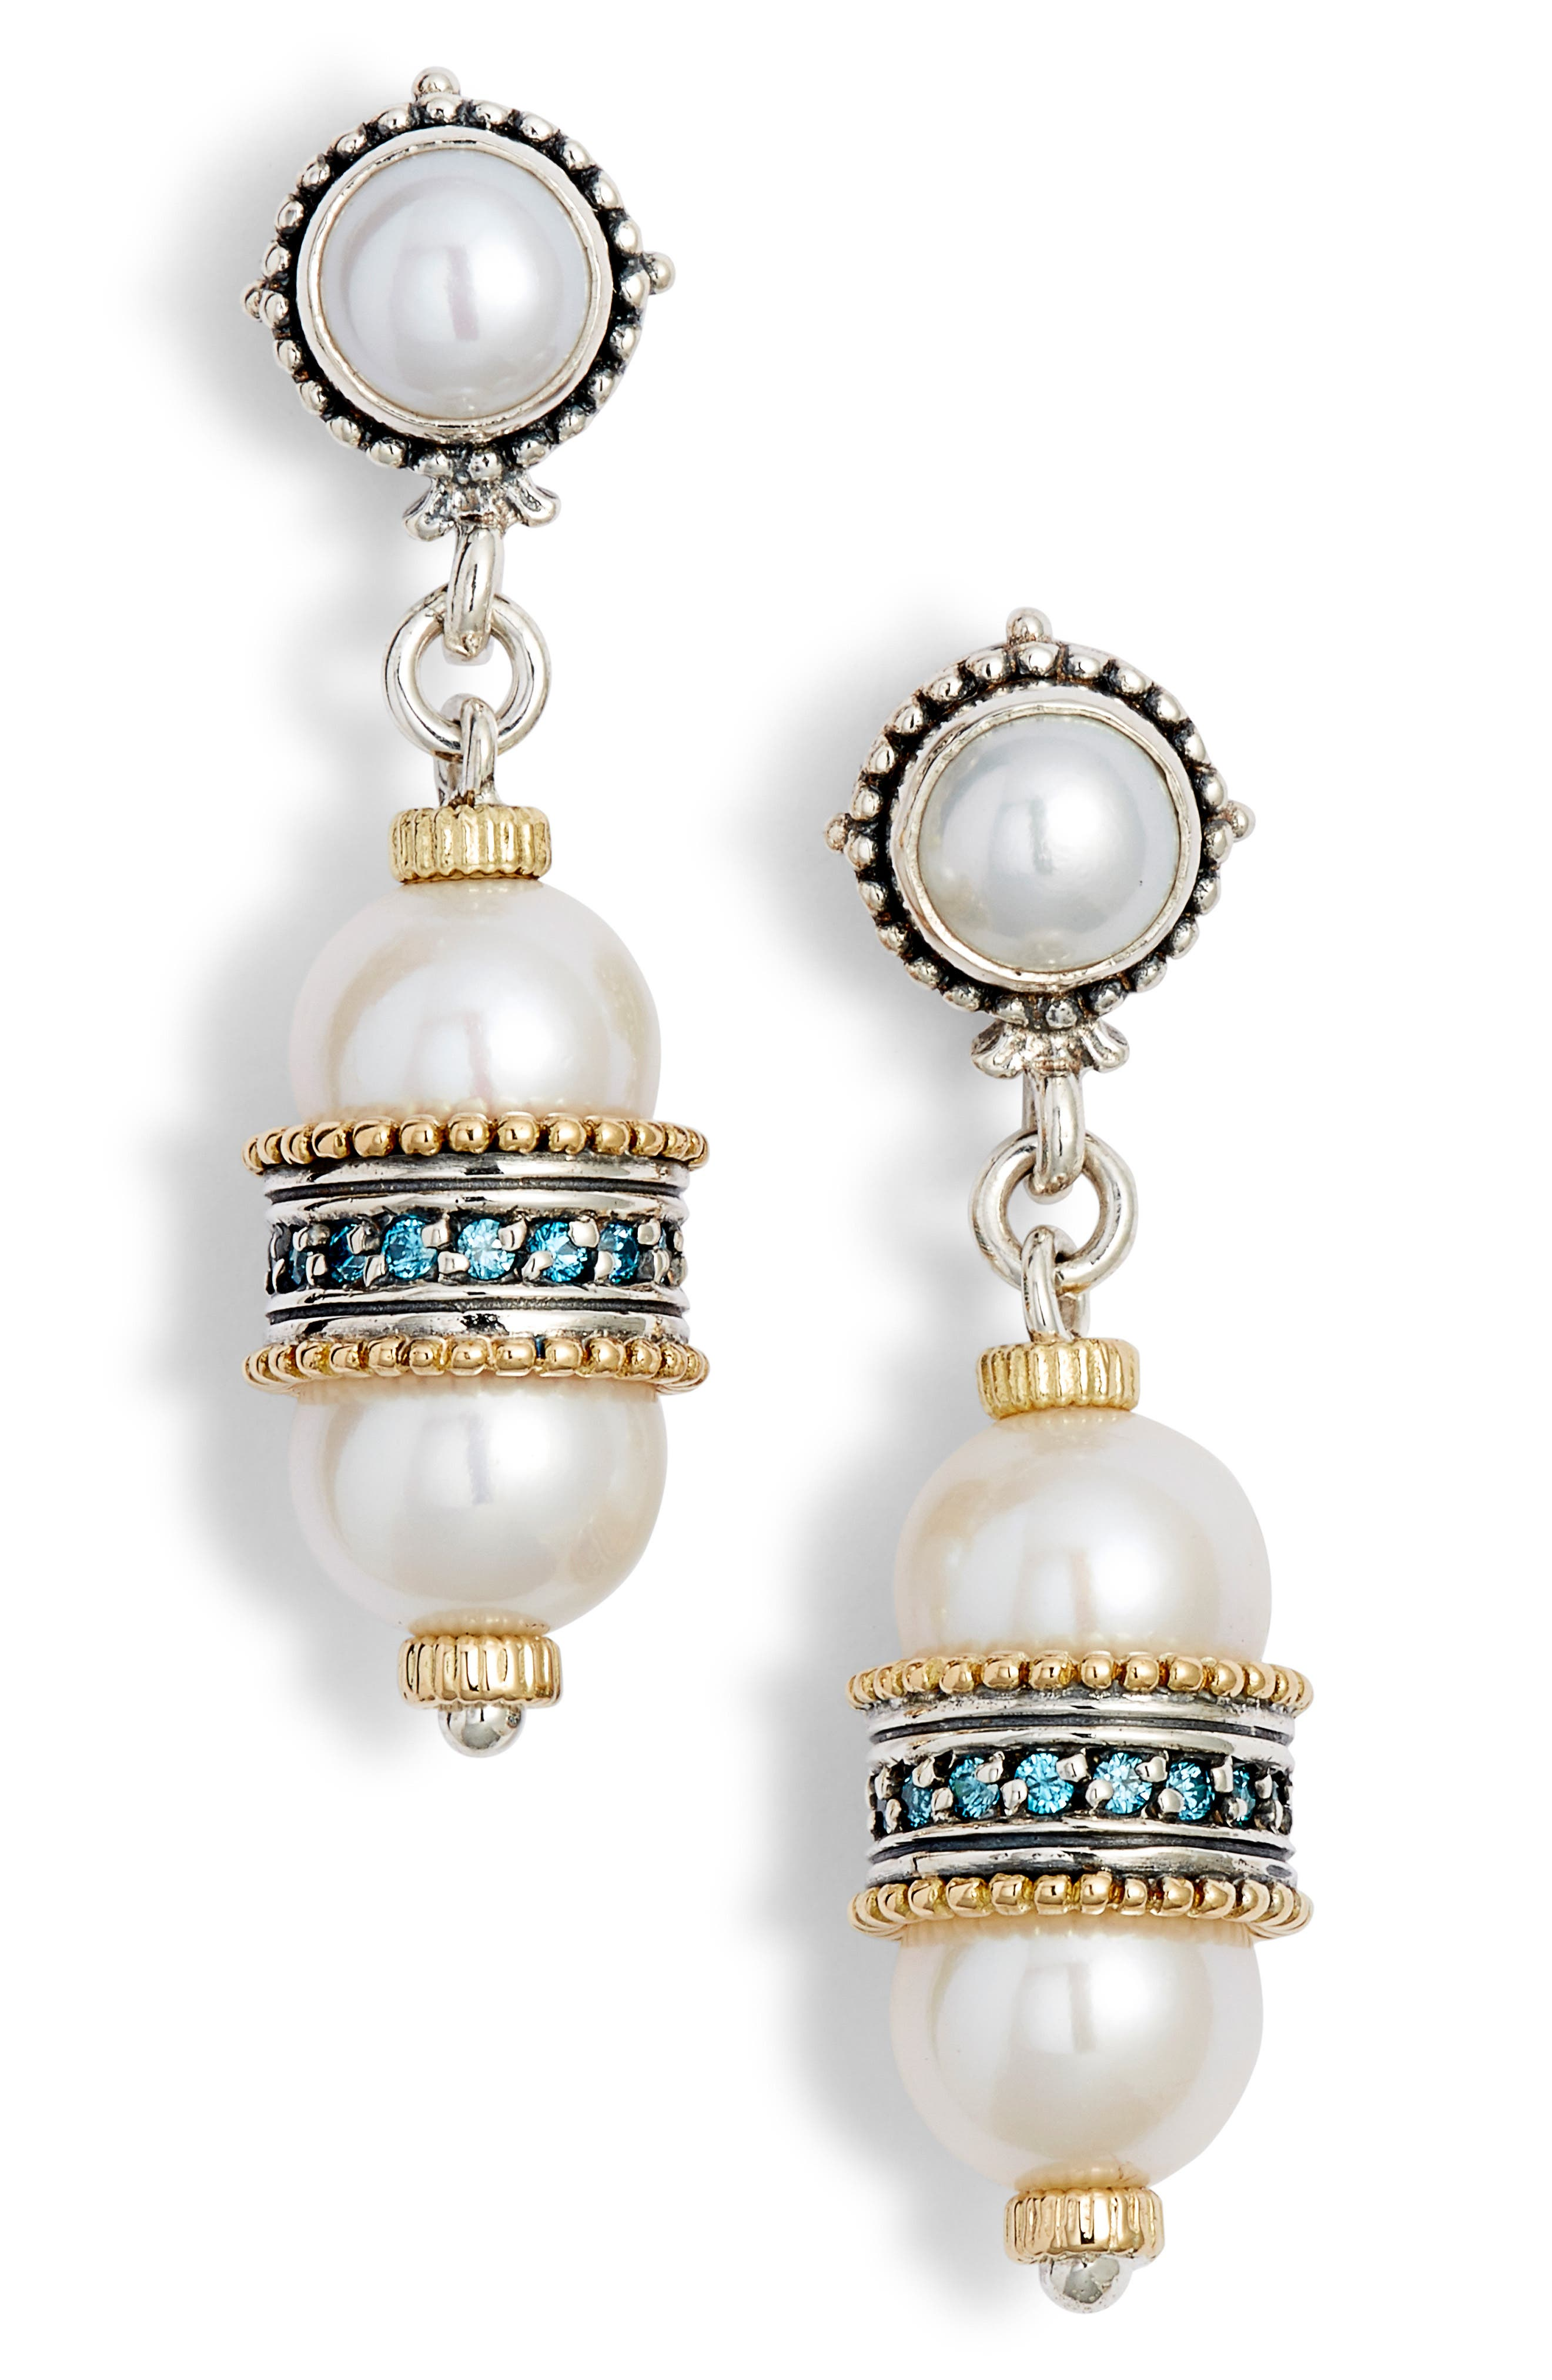 Thalia Double Pearl Drop Earrings,                             Main thumbnail 1, color,                             SILVER/ PEARL